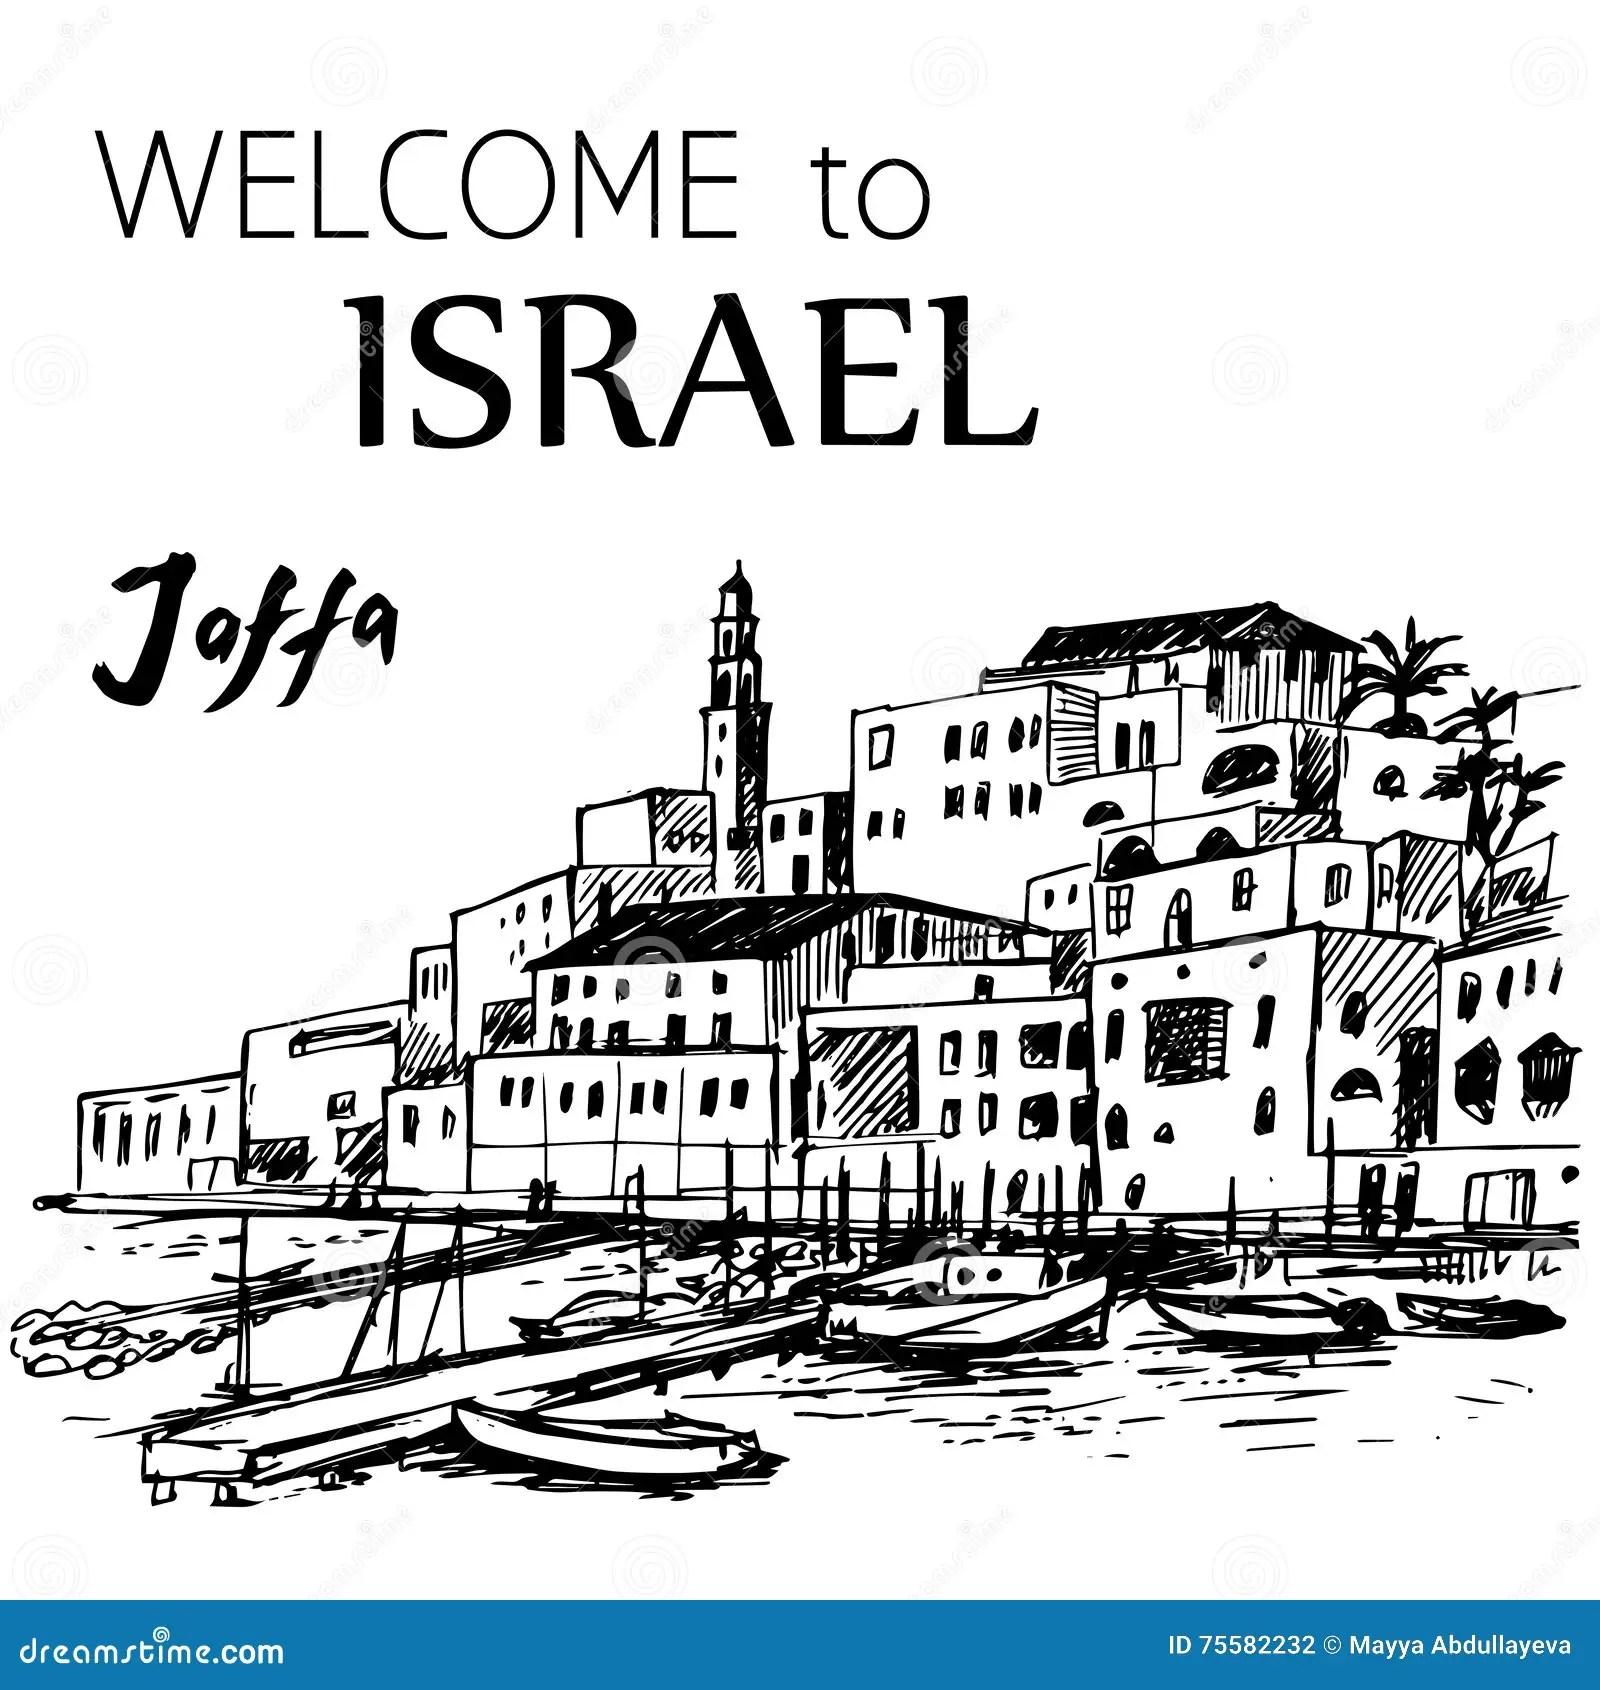 Aviv Cartoons Illustrations Amp Vector Stock Images